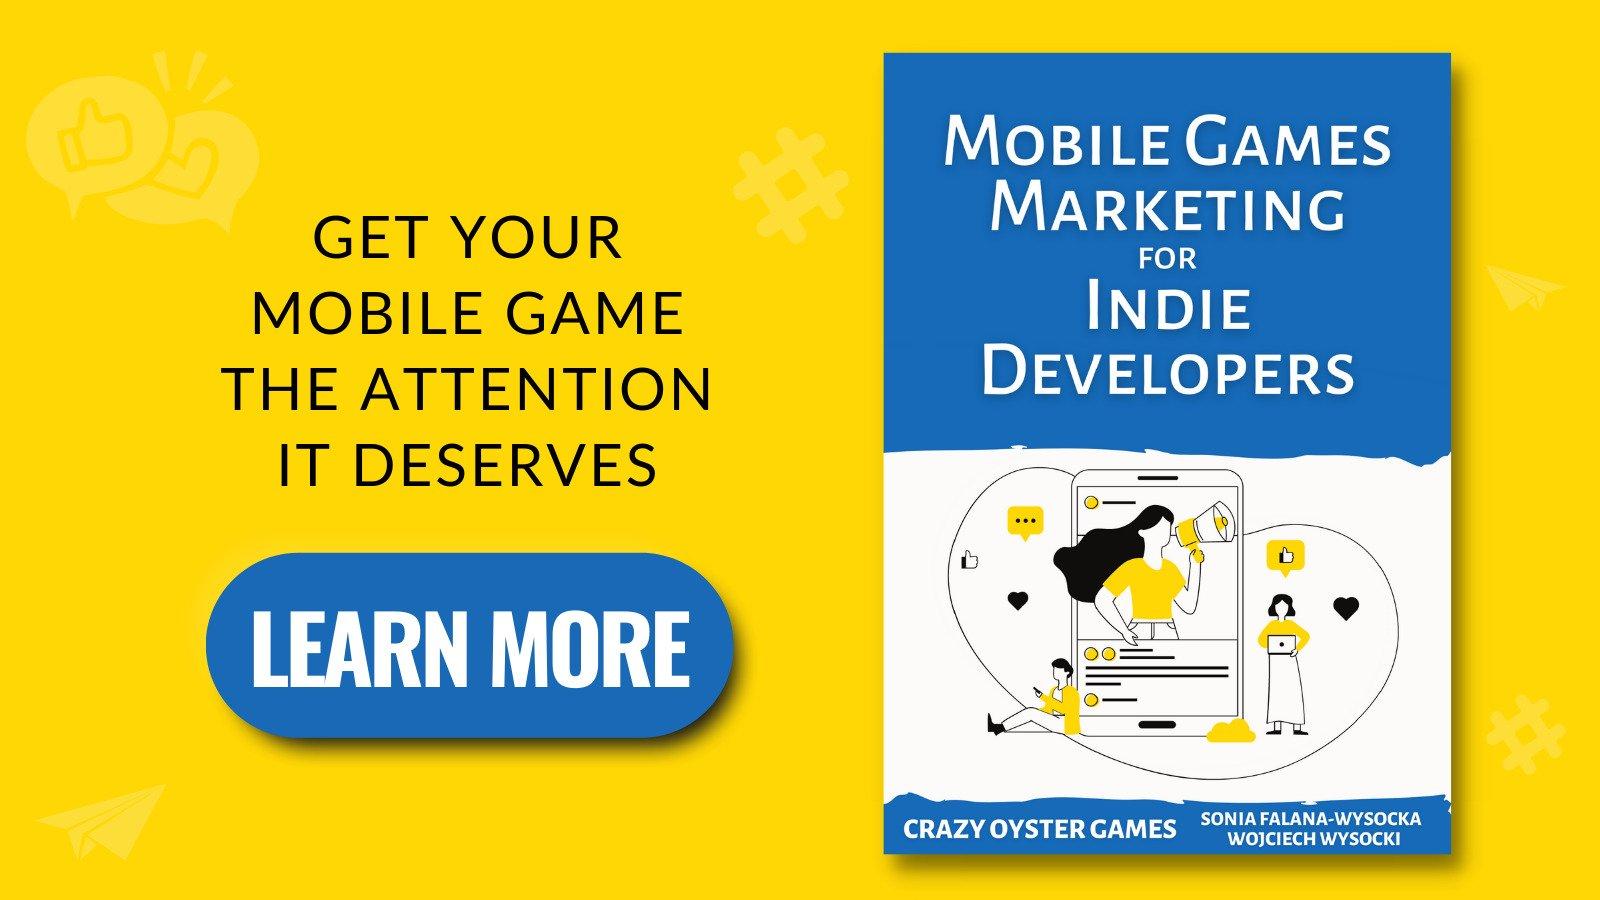 Pop up: Mobile Games Marketing